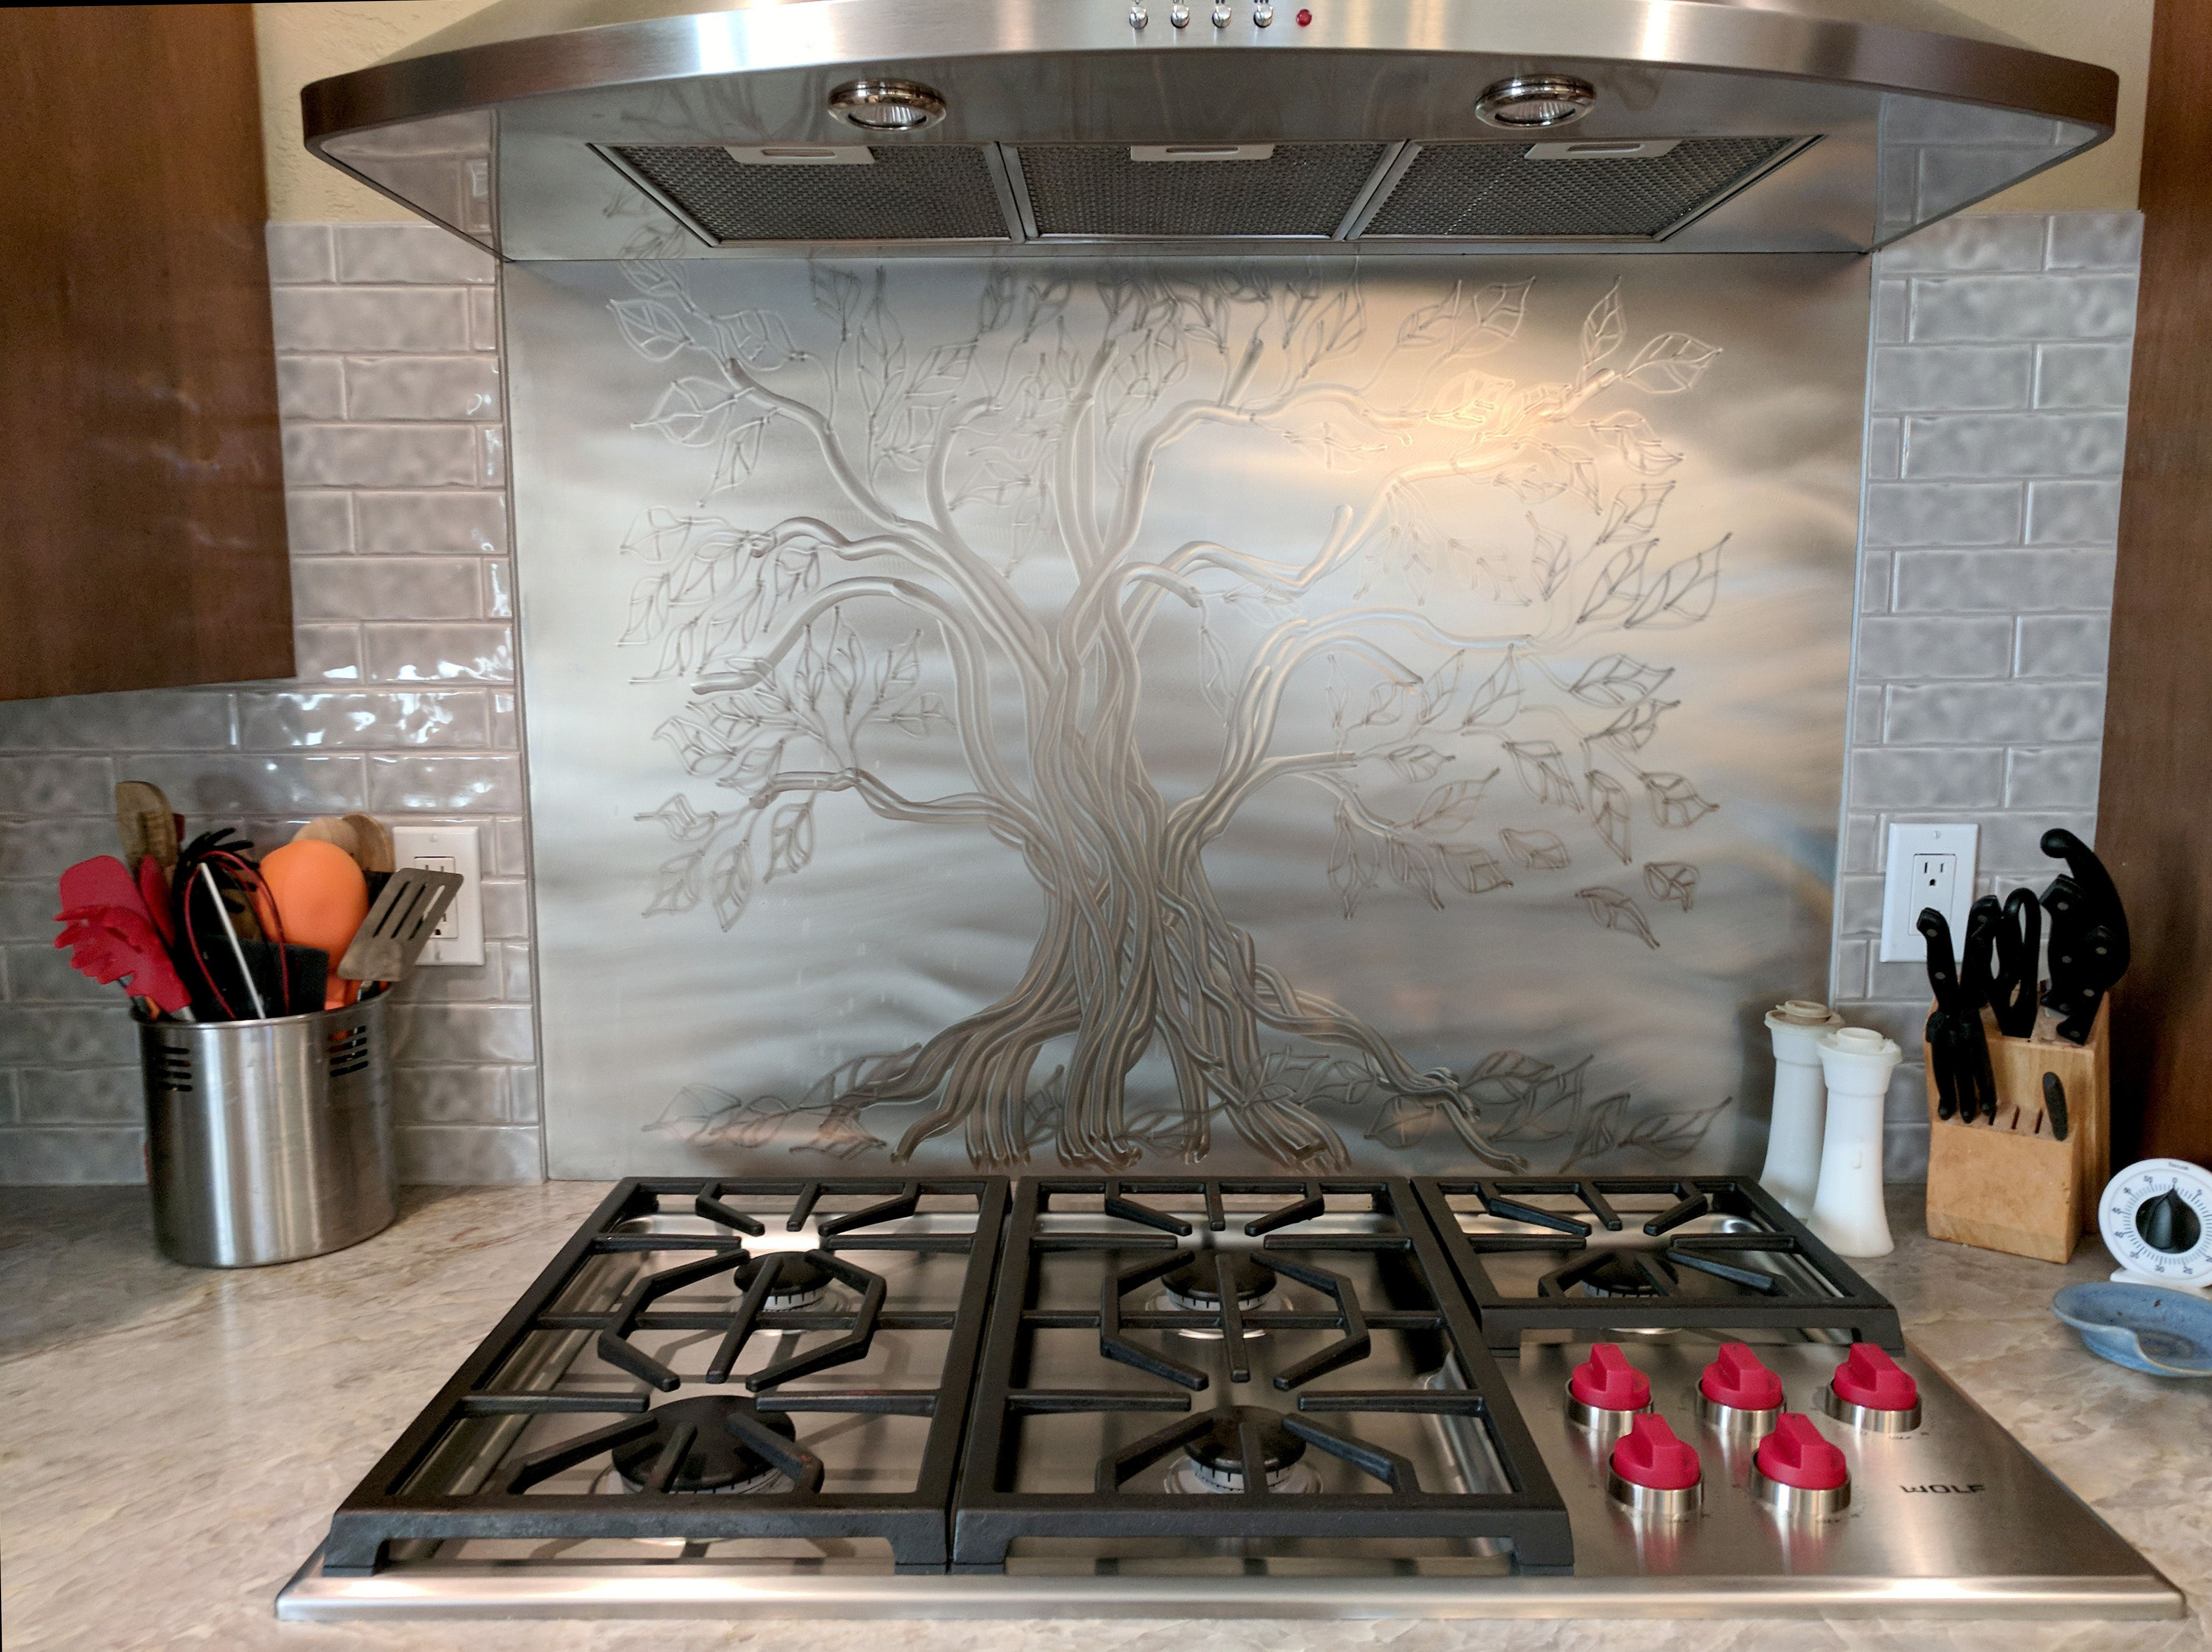 14+ Decorative stainless steel backsplash sheet inspirations